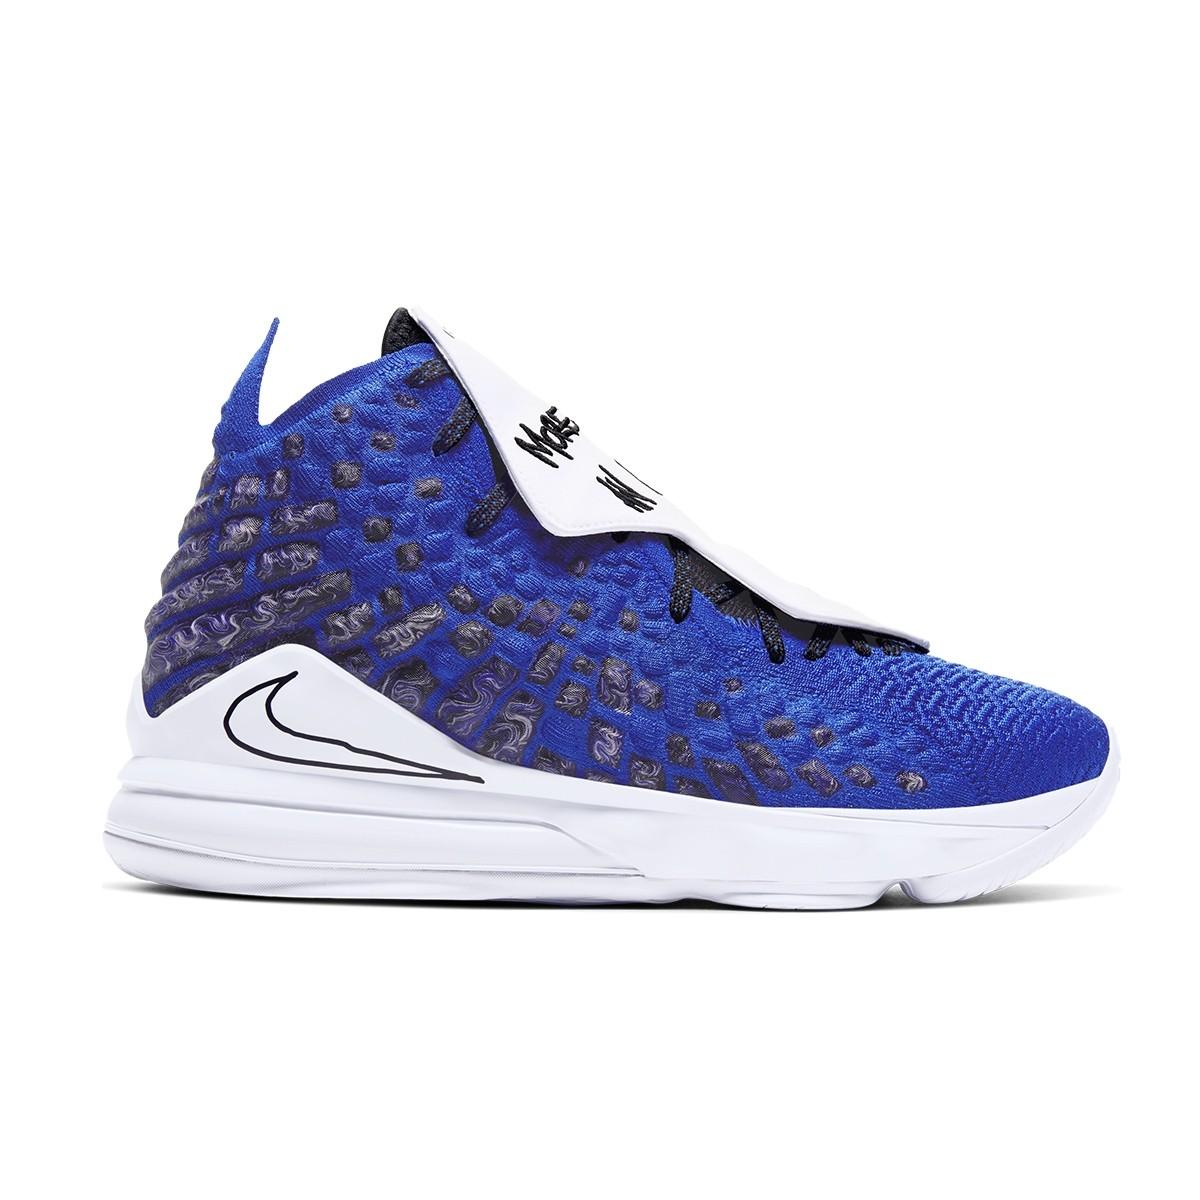 Nike Lebron XVII Jr 'More Than an Athlete'